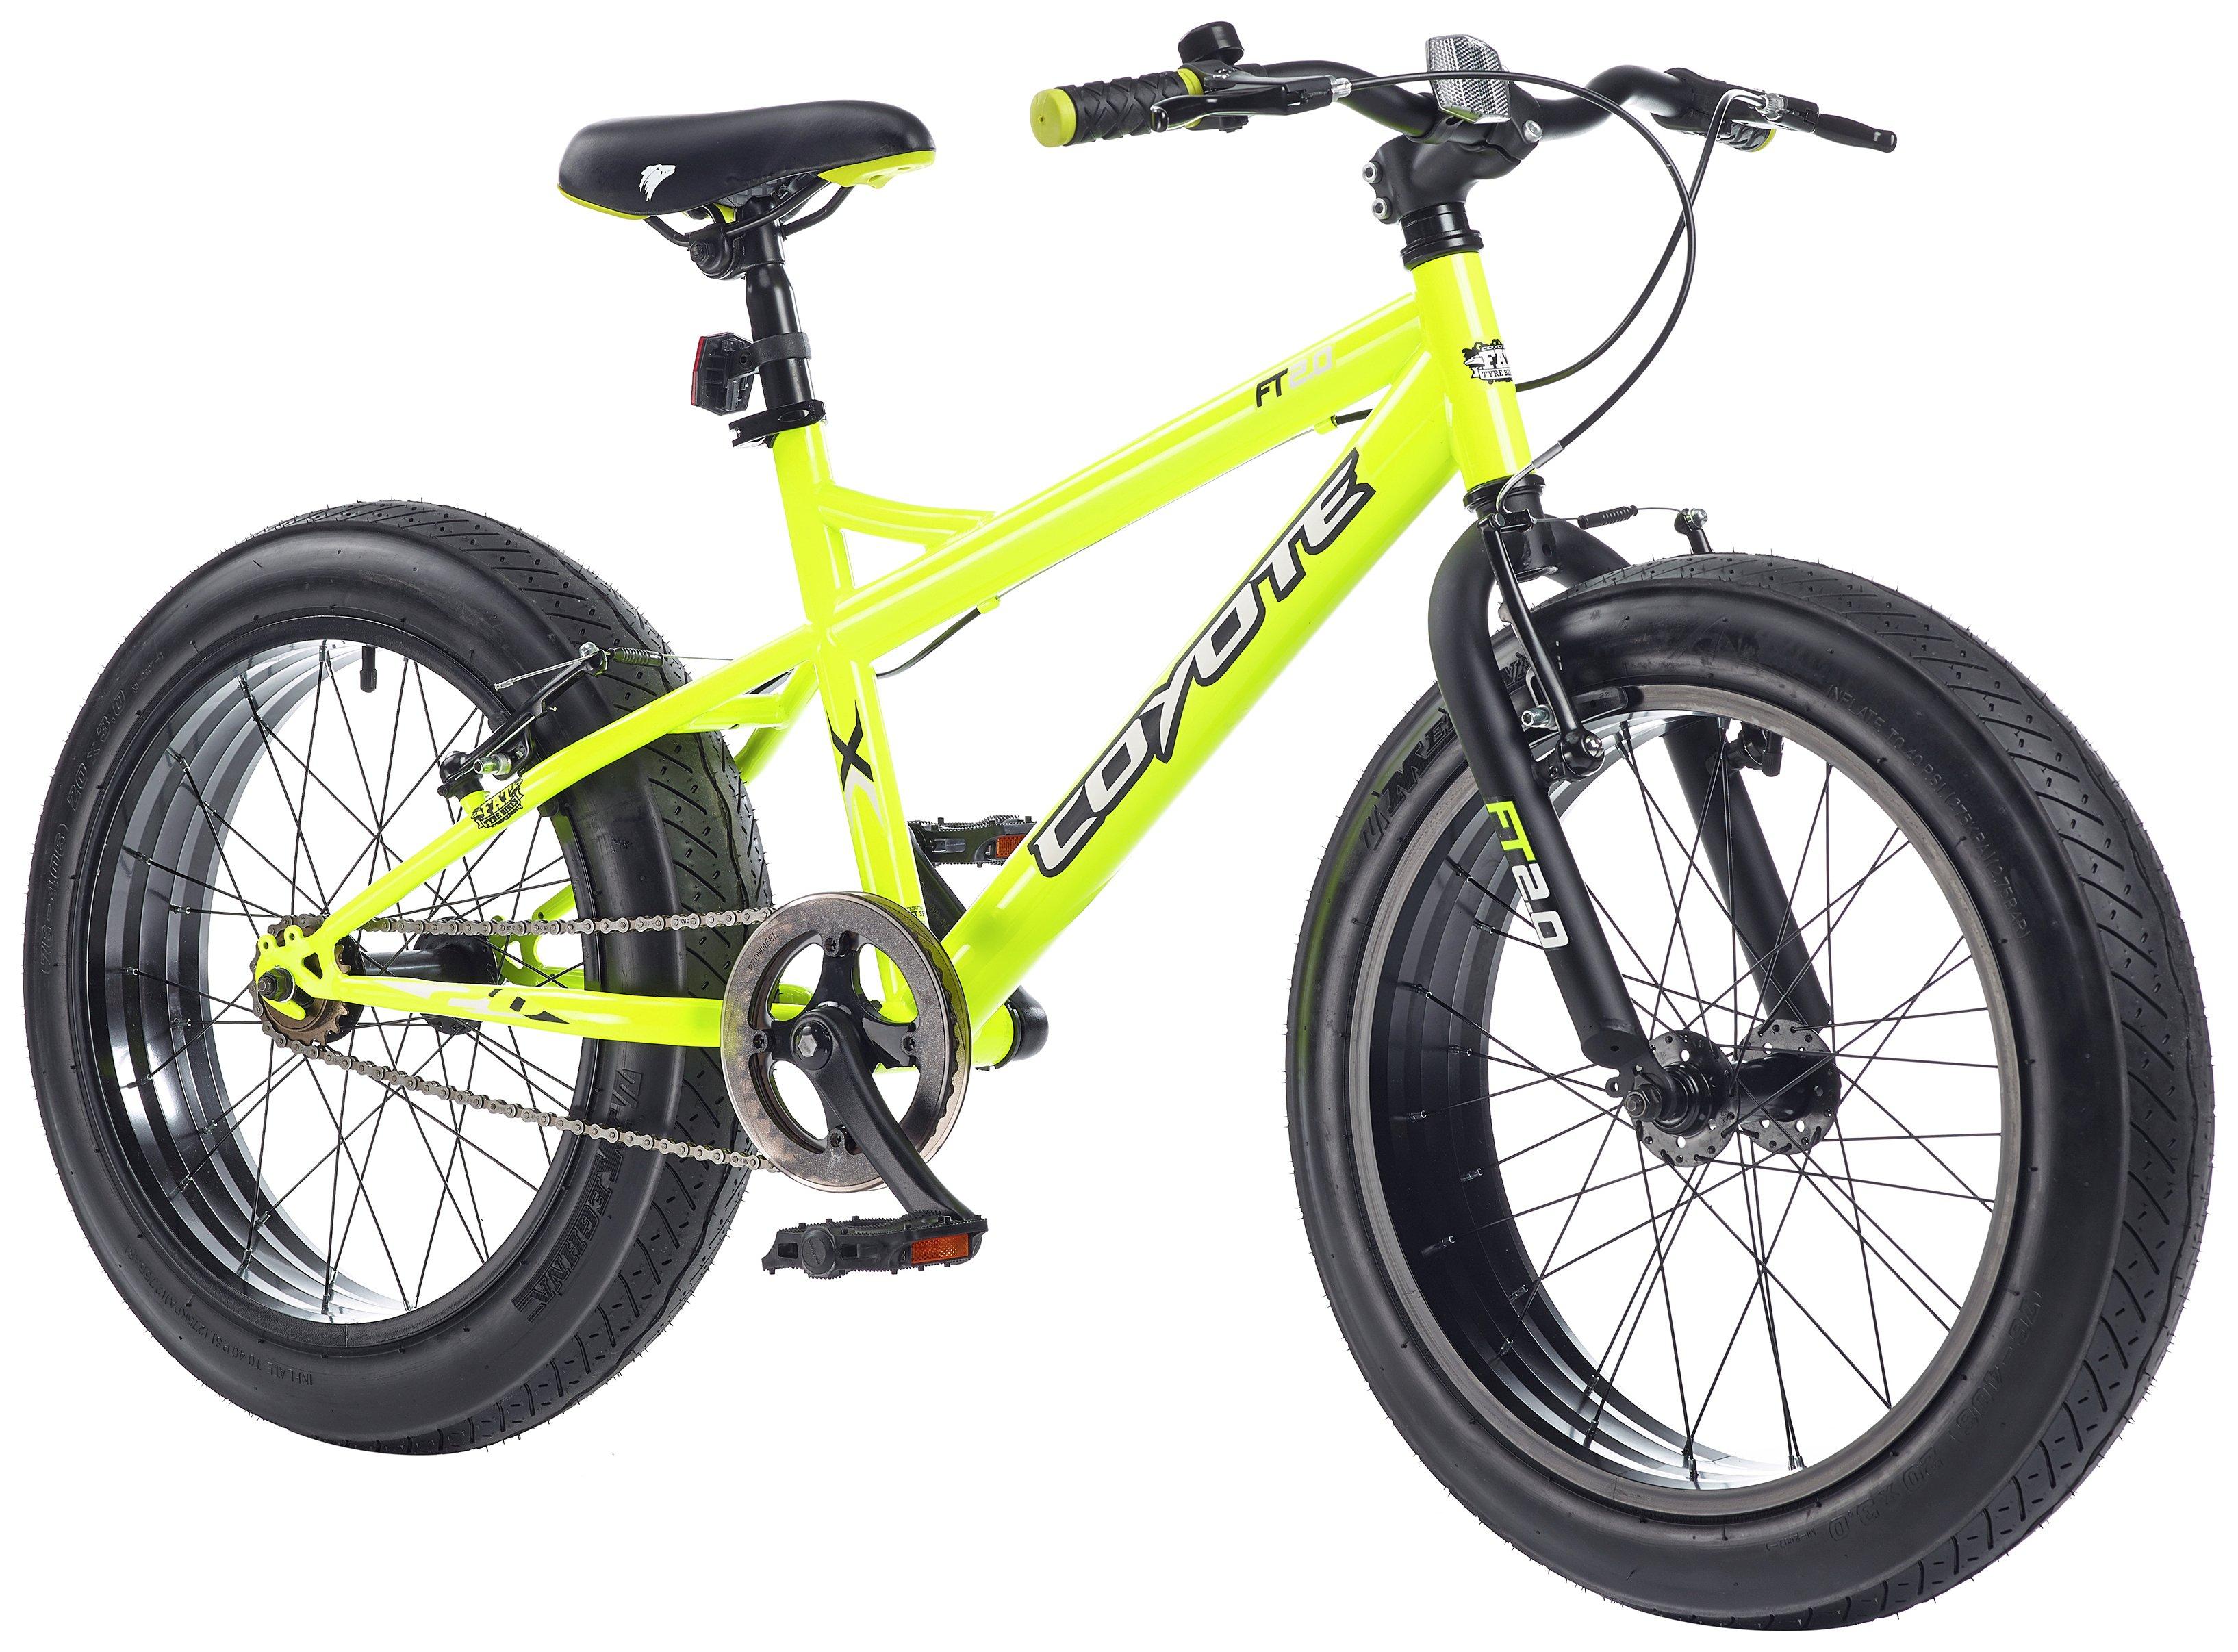 Image of Coyote Fatman 14 Inch All Terrain BMX Bike